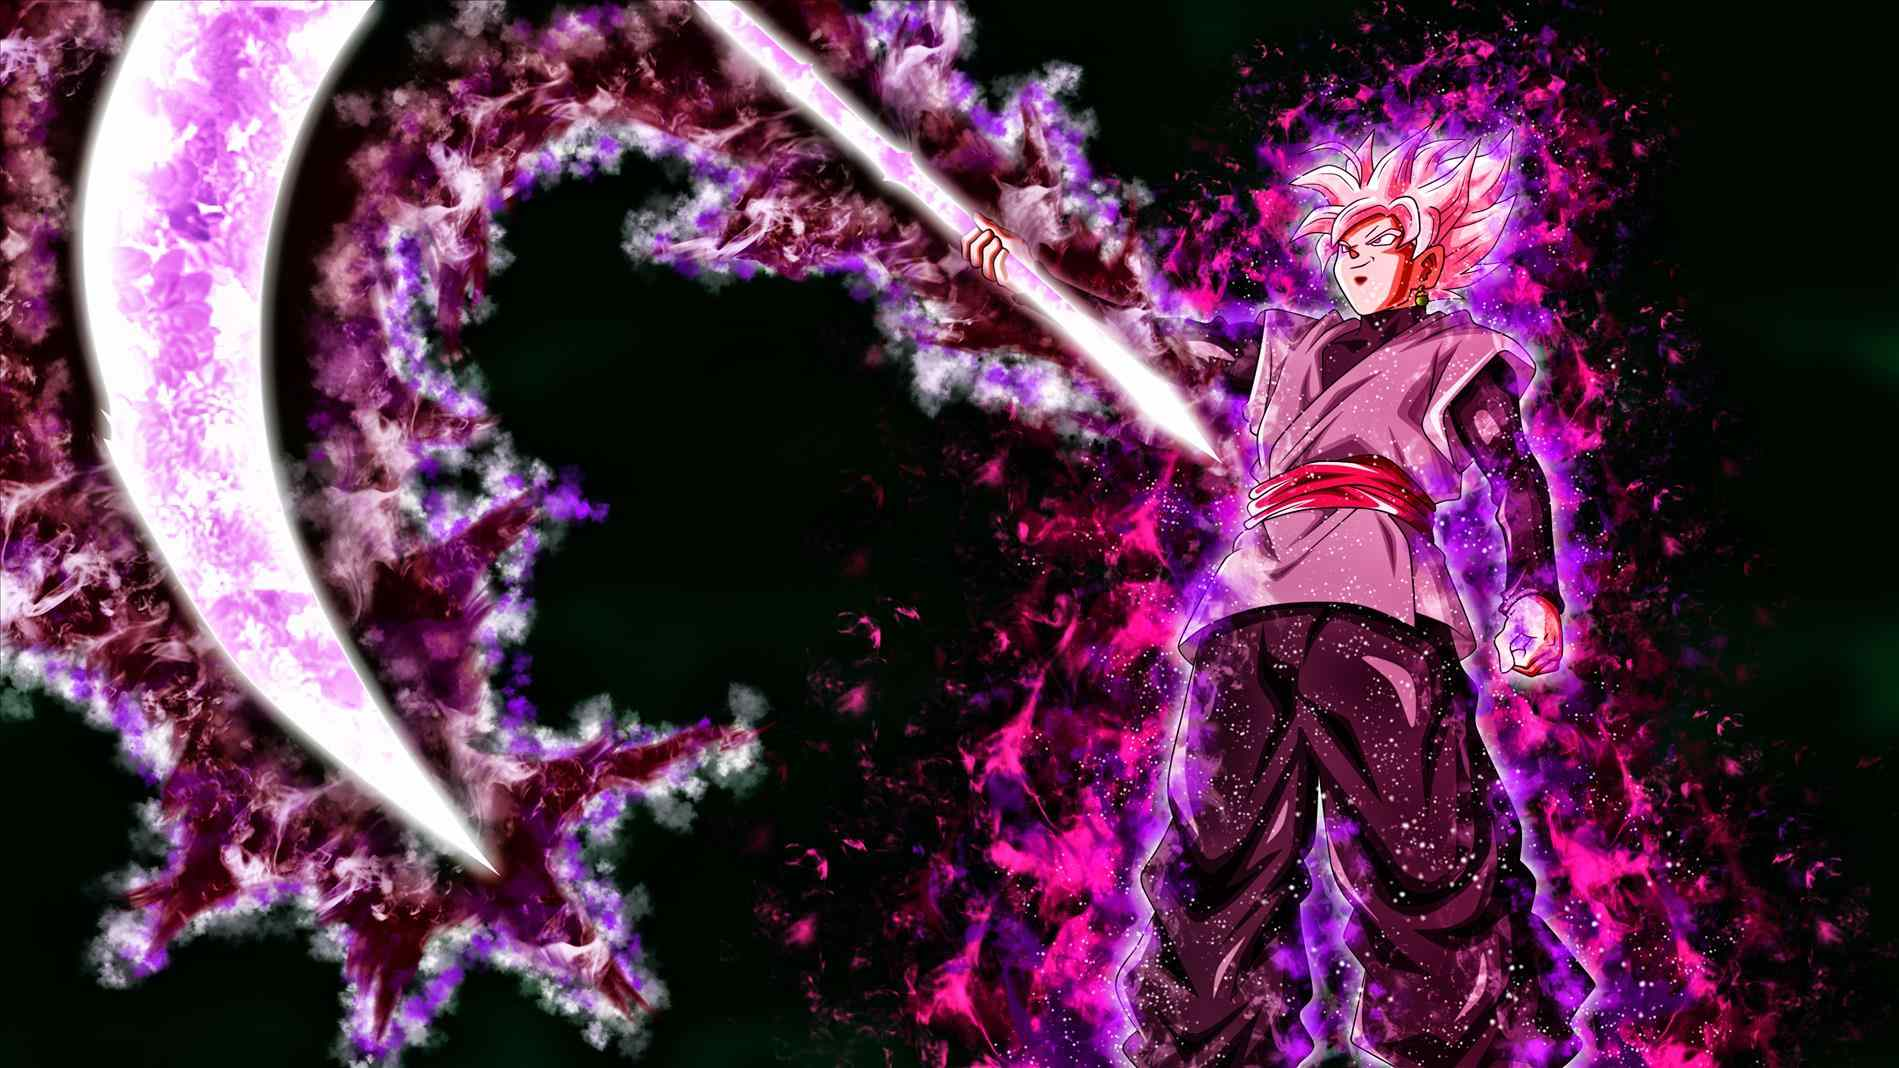 Goku Black Rose Desktop Wallpapers Wallpaper Cave